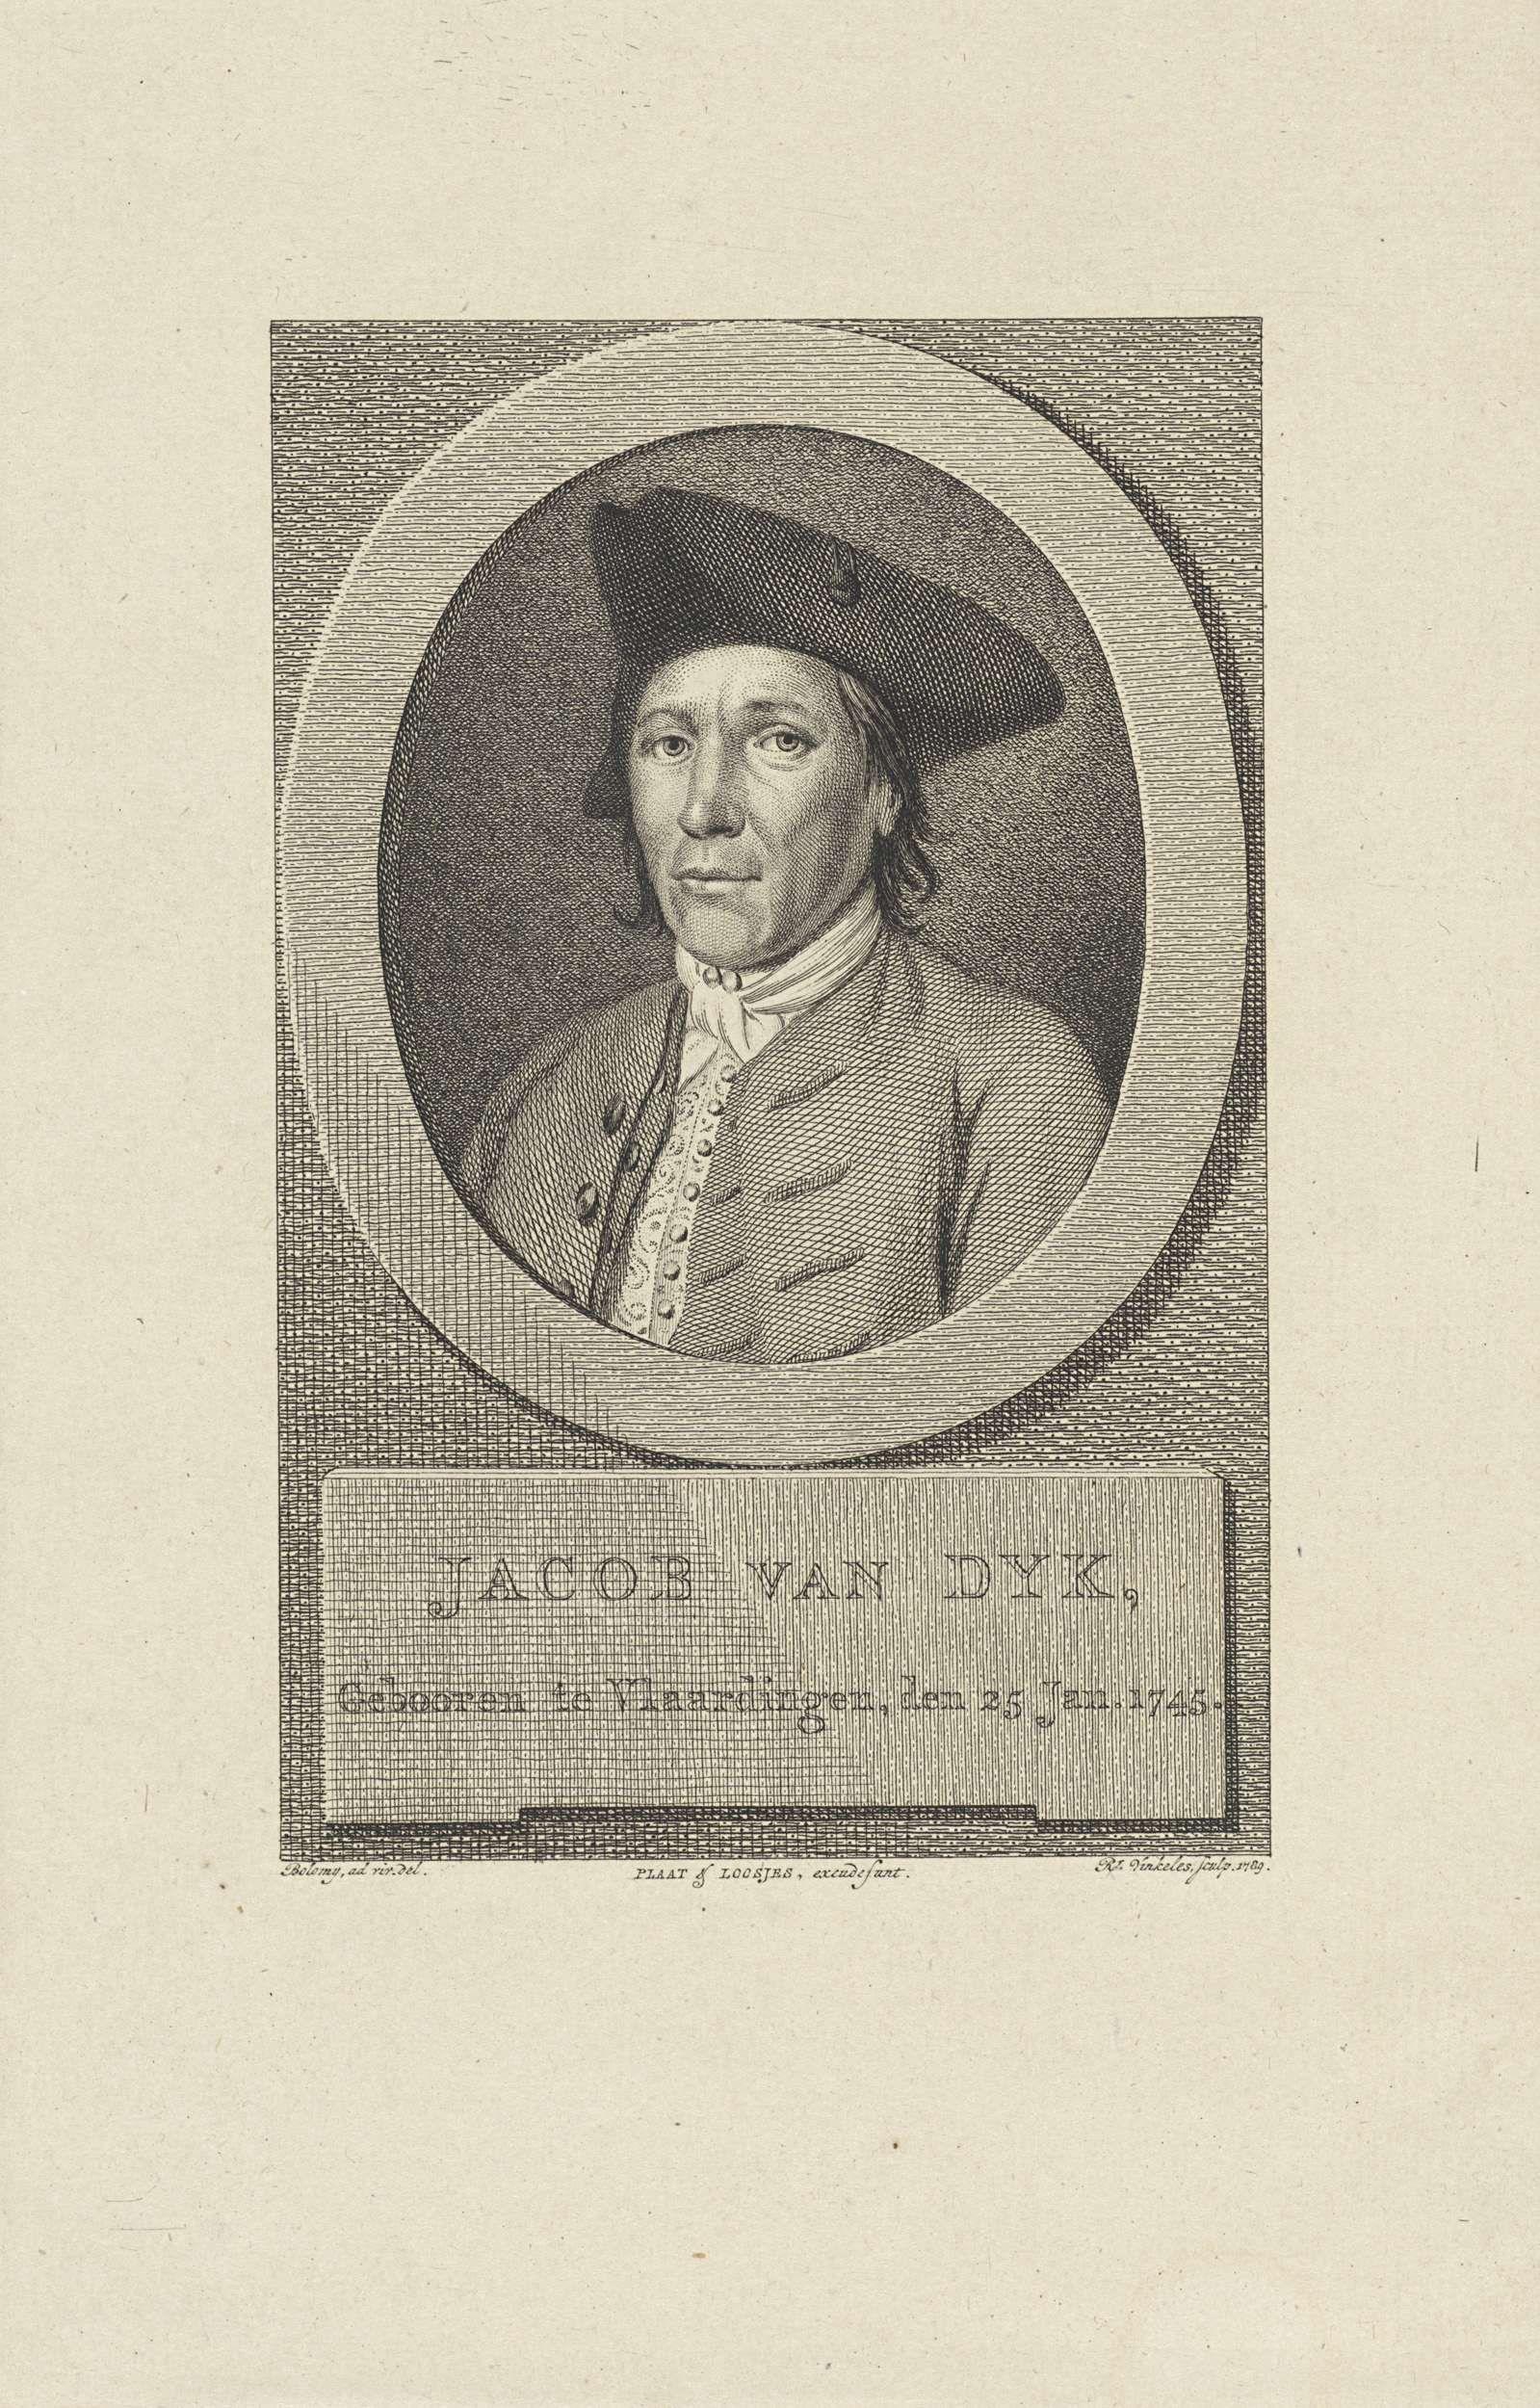 Reinier Vinkeles | Portret van Jacob van Dyk, Reinier Vinkeles, Plaat & Loosjes, 1789 | Portret van de dichter Jacob van Dyk.